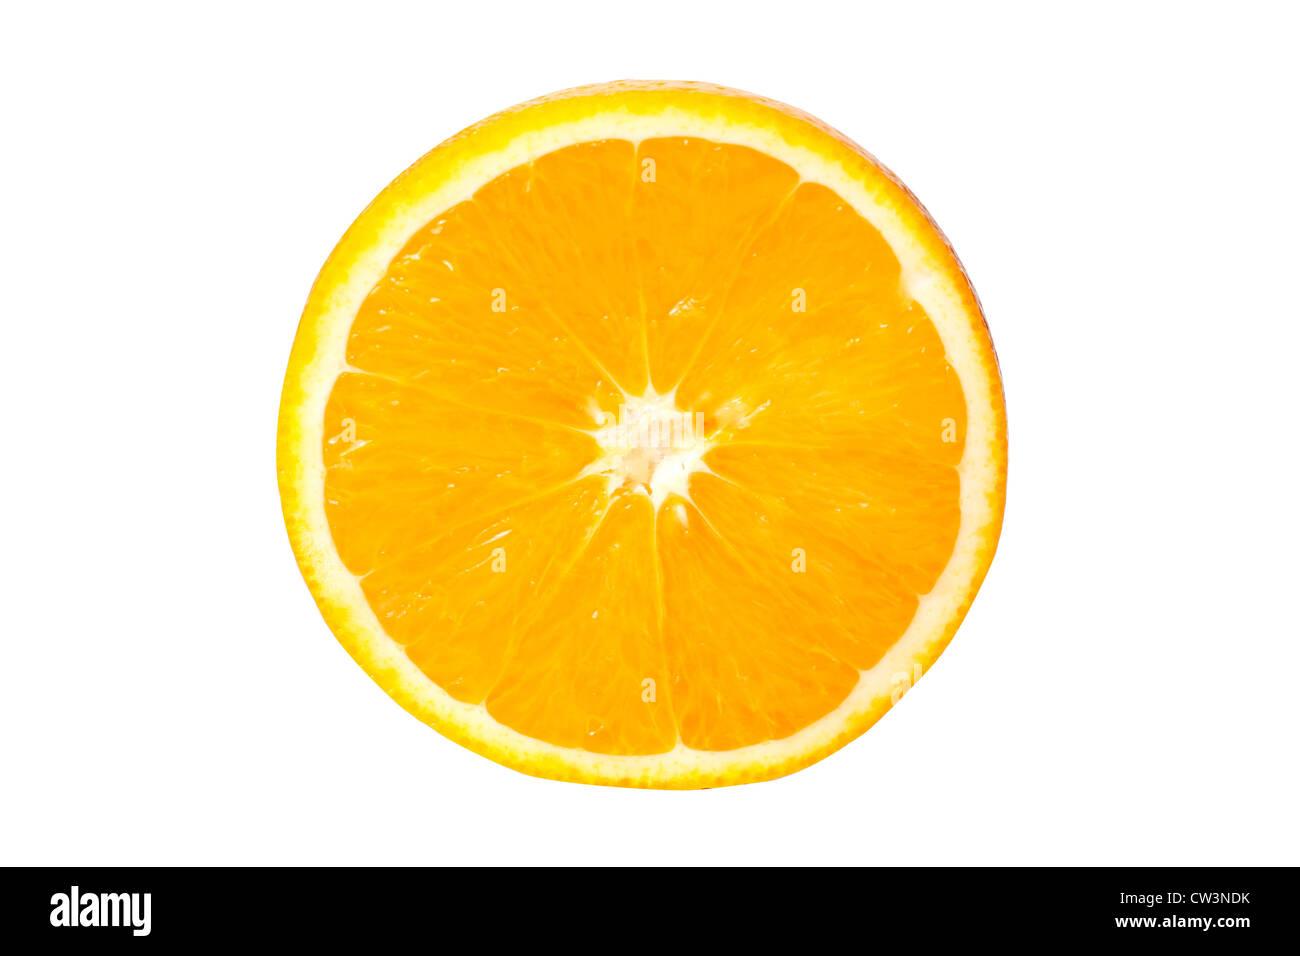 Rodajas de naranja aislado en blanco Imagen De Stock